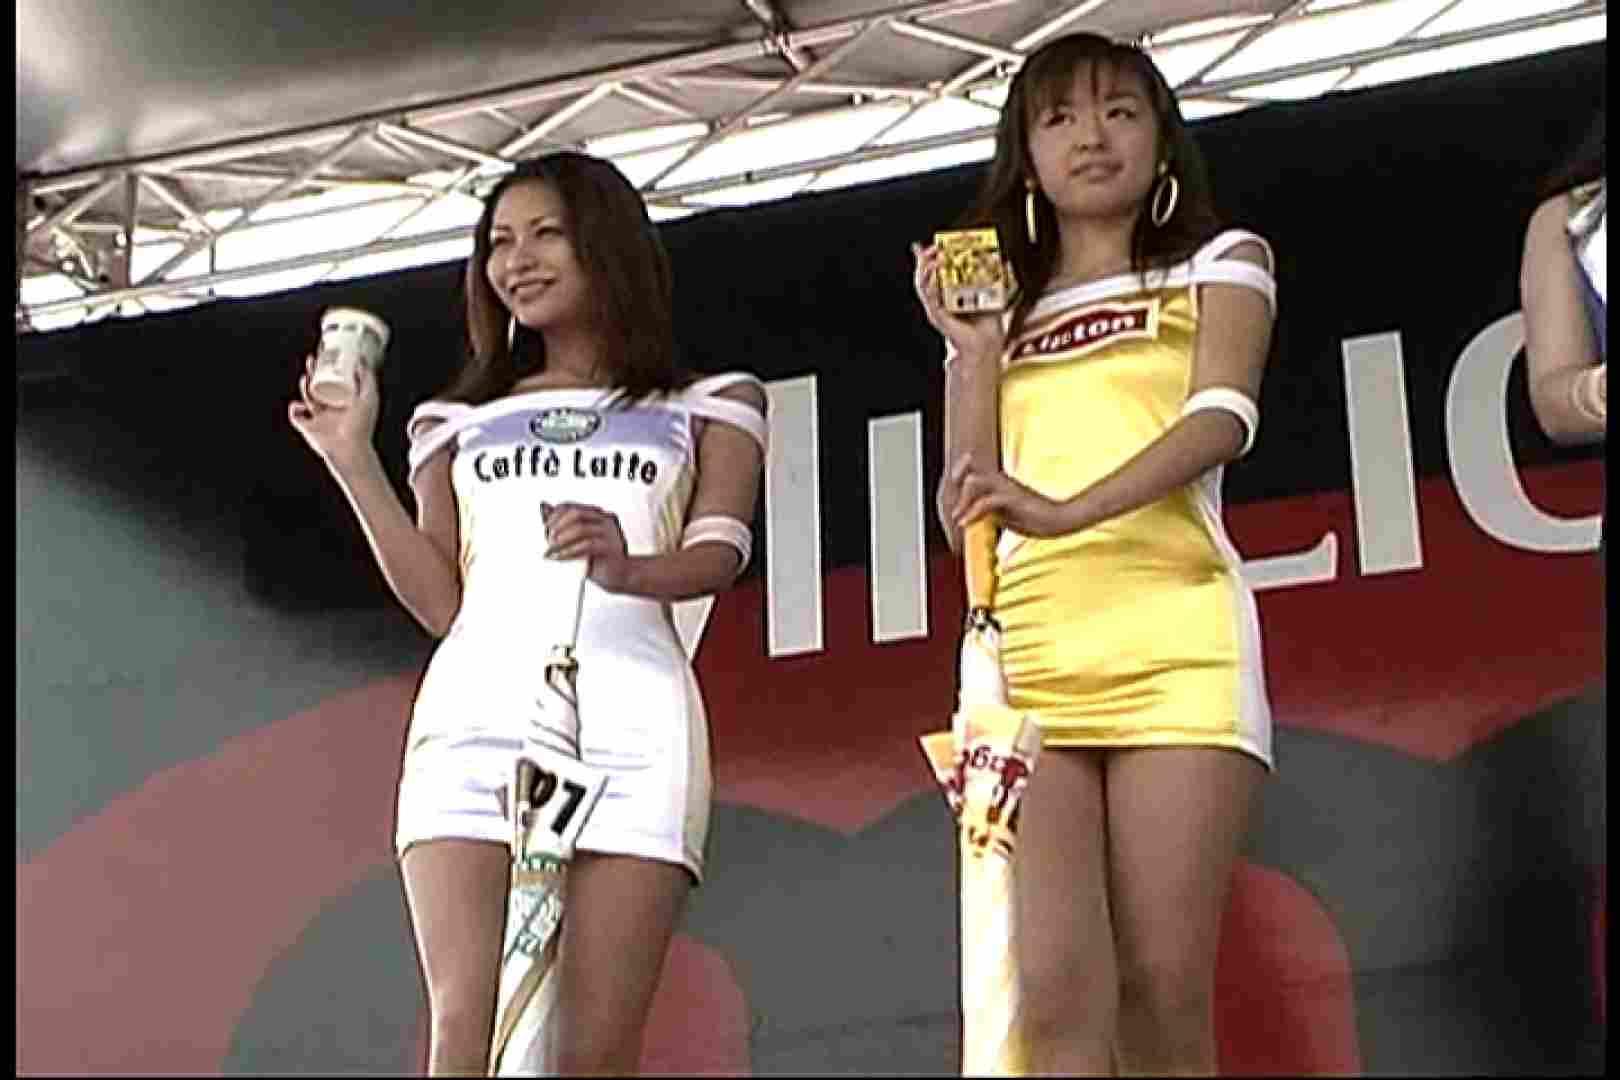 RQカメラ地獄Vol.6 OLヌード天国 | レースクイーン  58PIX 5